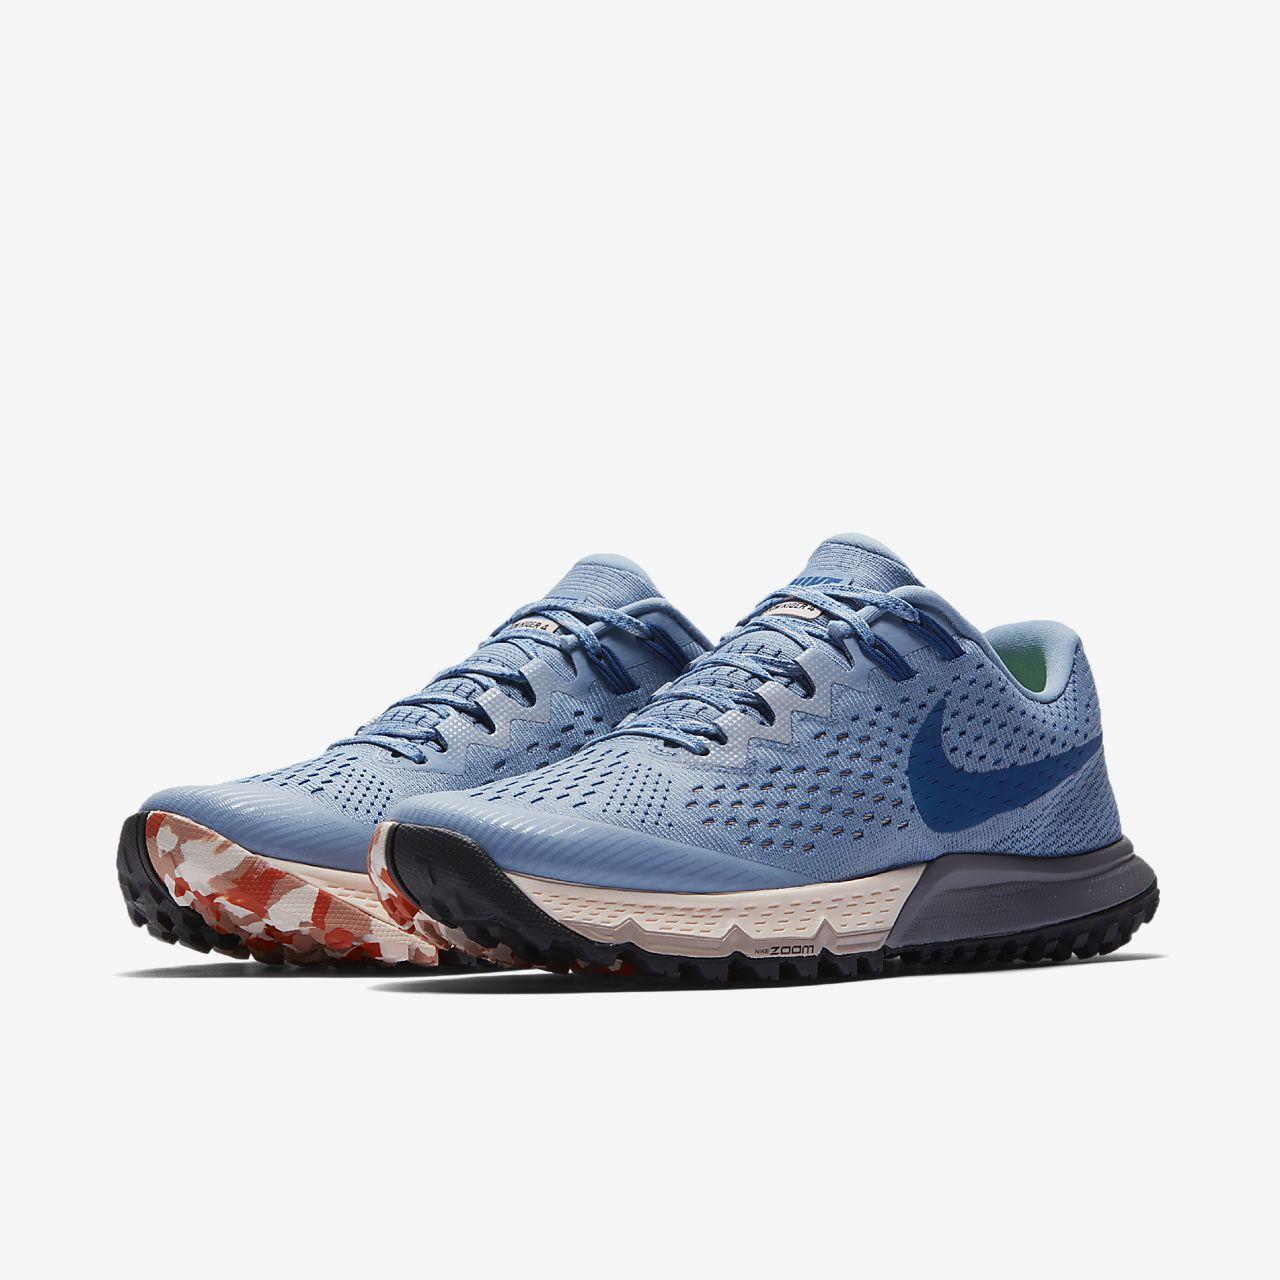 64ebb270f39d Nike Air Zoom Terra Kiger 4 Women s Running Shoe. Nike.com MA